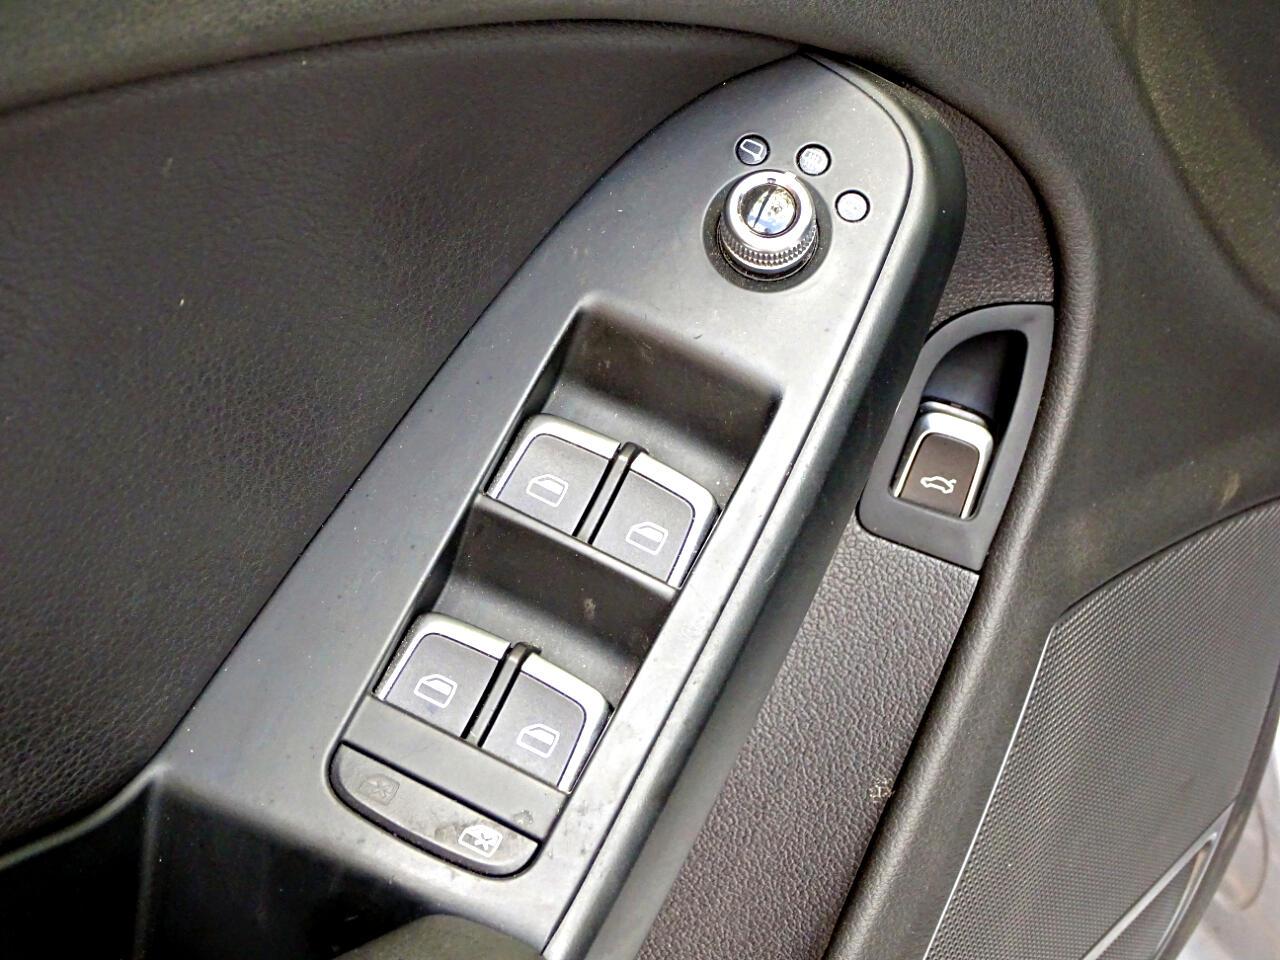 2015 Audi A4 4dr Sdn Auto quattro 2.0T Premium